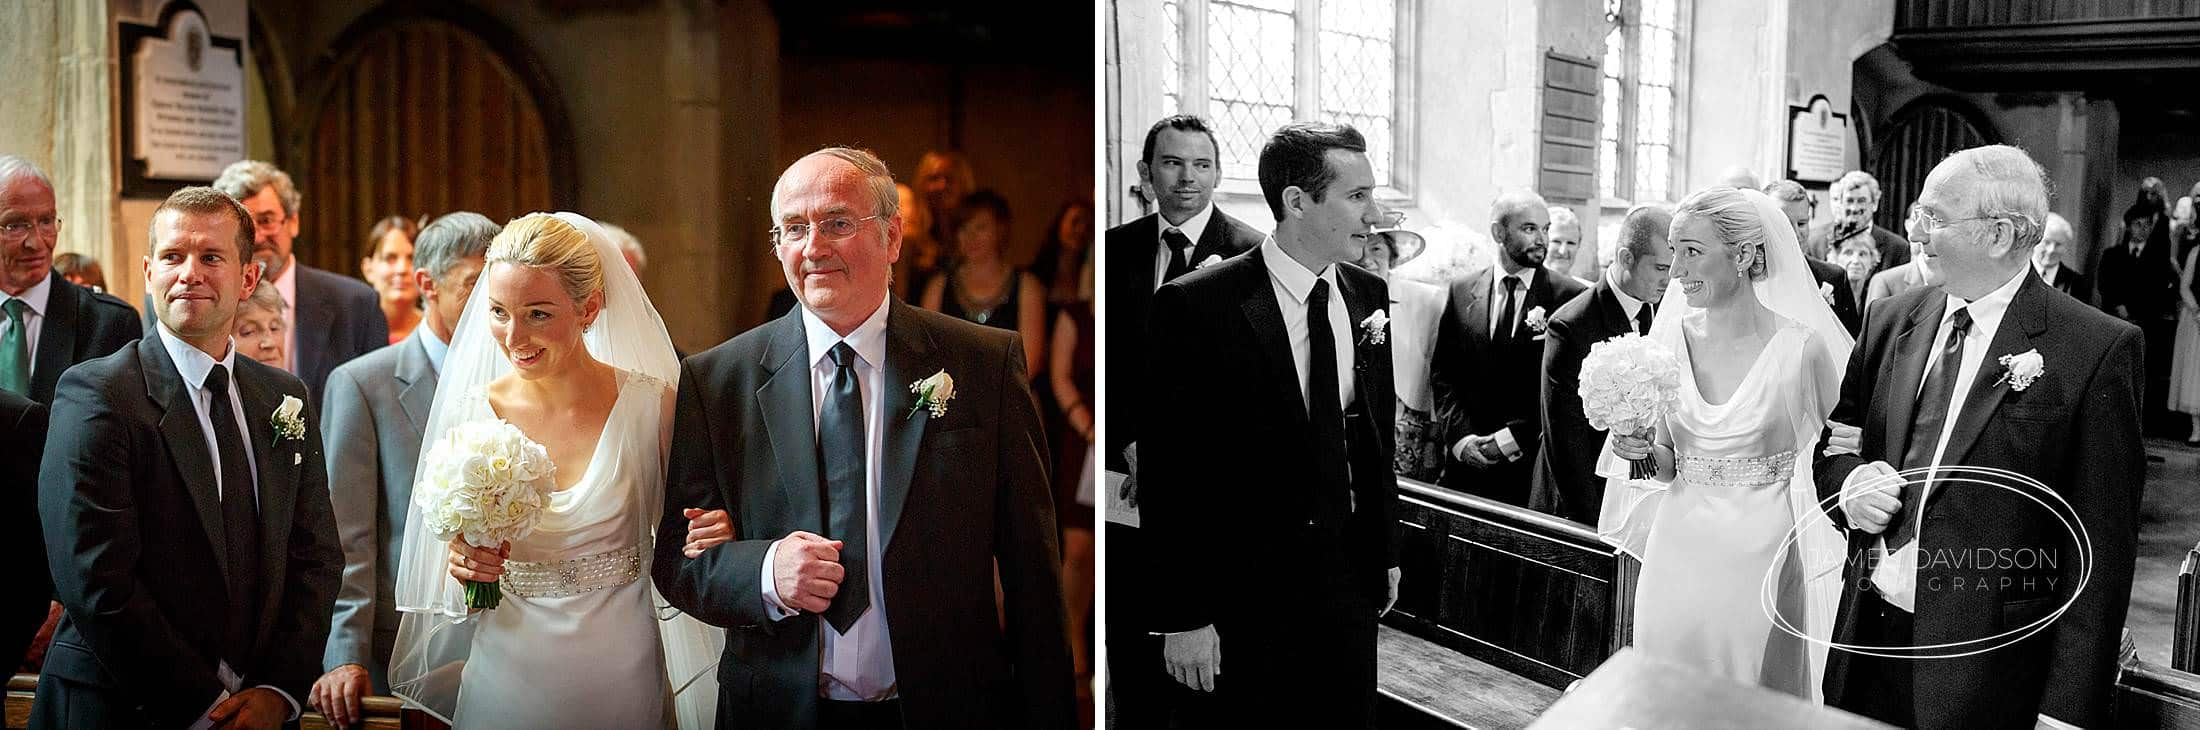 hengrave-hall-summer-wedding-041